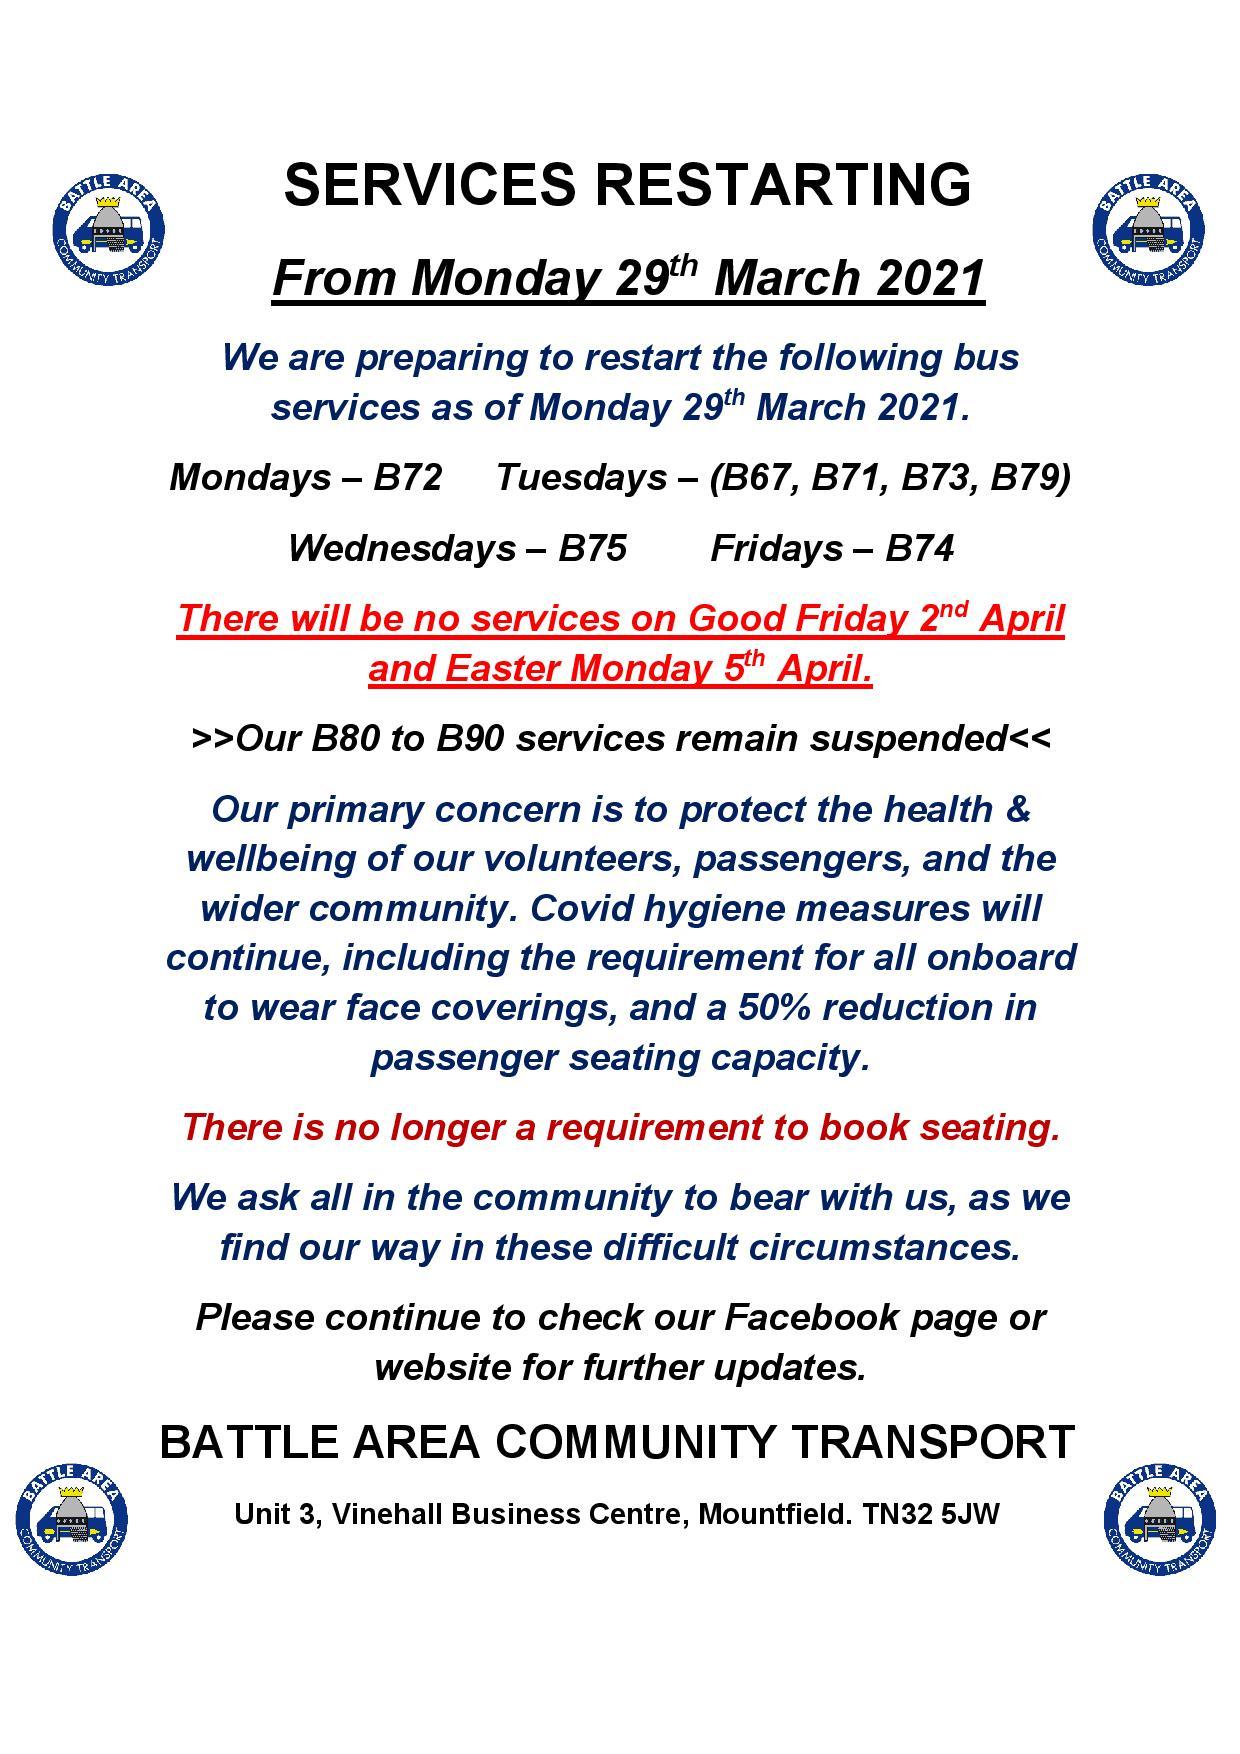 Battle Area Community Transport Update